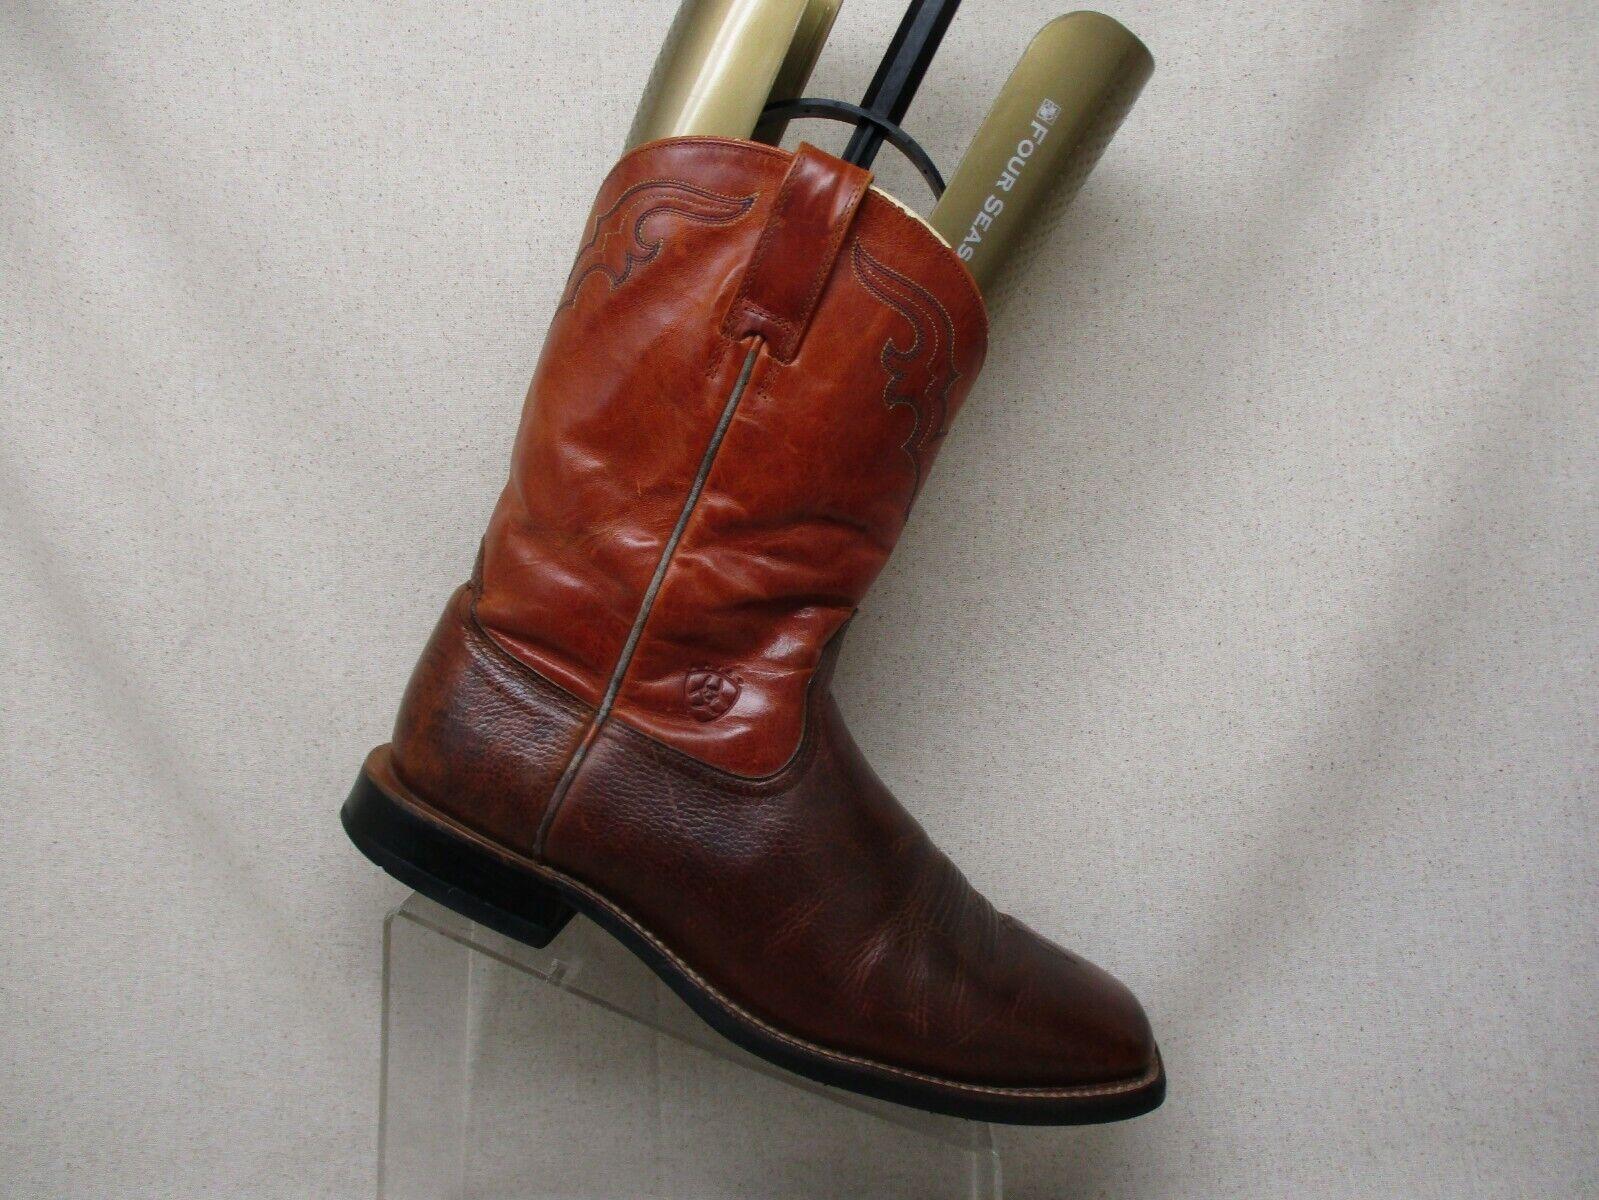 Ariat arancia Marroneee Leather Western Cowboy stivali Mens Dimensione 12 D Style 53384